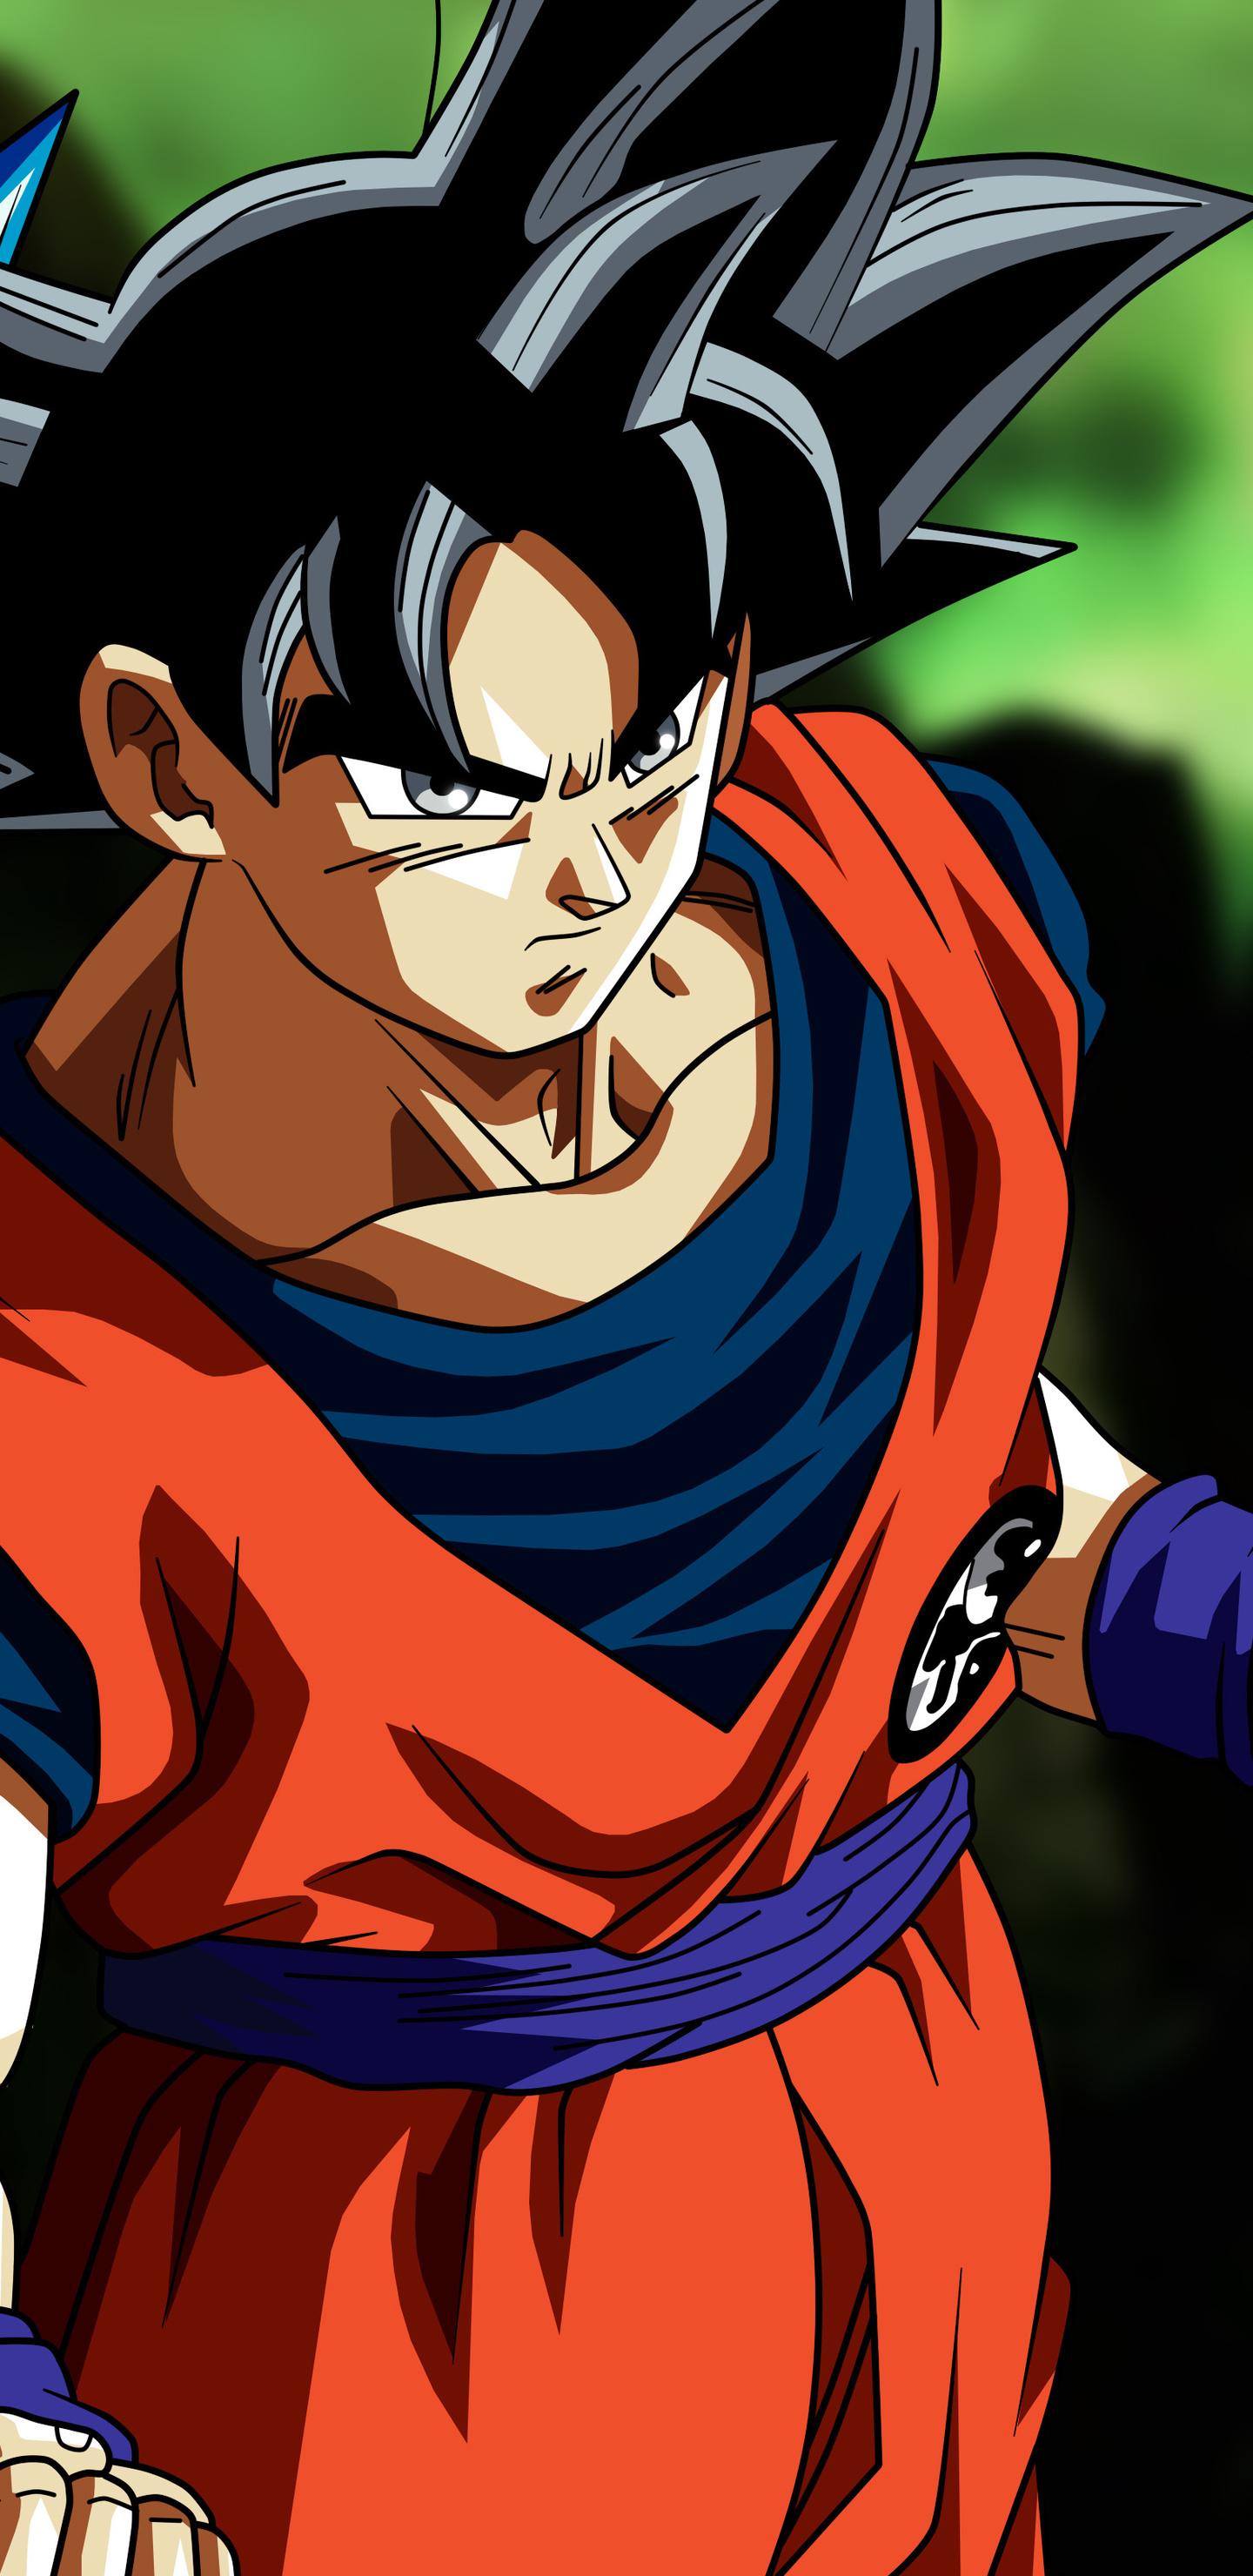 1440x2960 Son Goku Vegeta In Dragon Ball Super 5k Samsung Galaxy